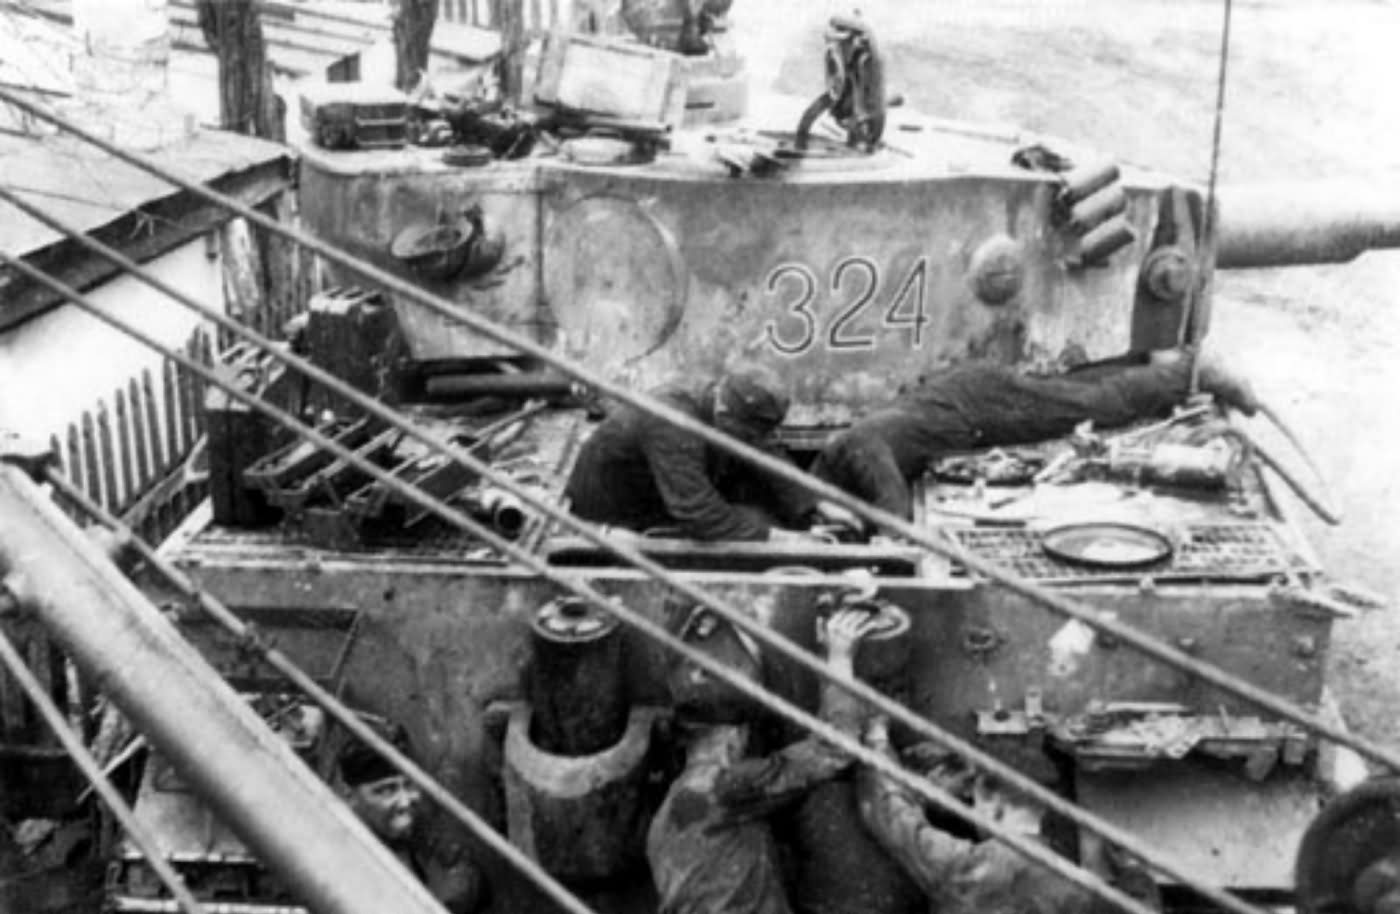 Panzer VI Tiger of Schwere Panzer-Abteilung 503, tank number 324